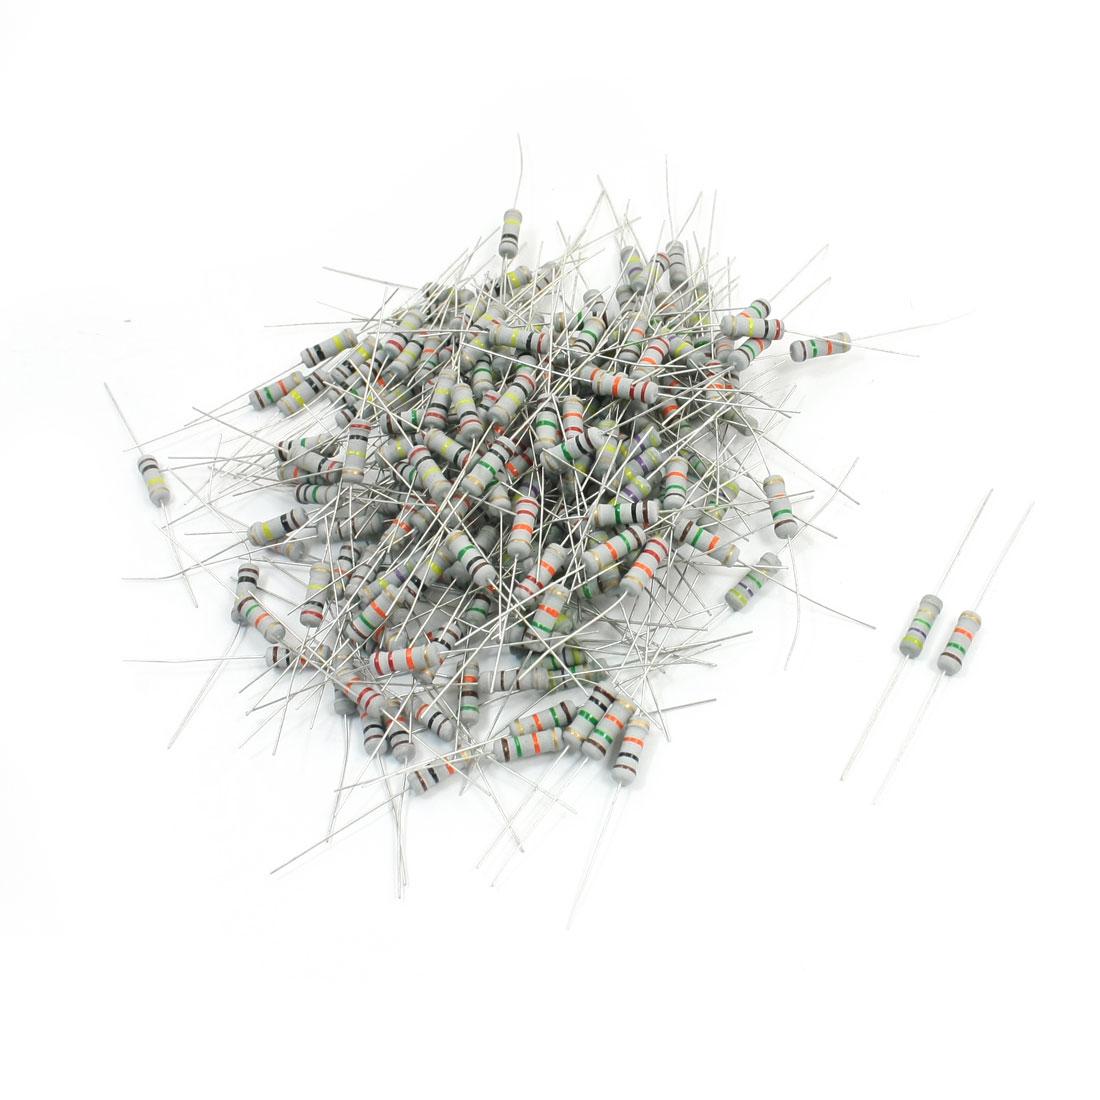 5% Tolerance Axial Leading Type Through Hole 4 Color Ring Carbon Film Fixed Resistors Assortment Kit Set 200Pcs